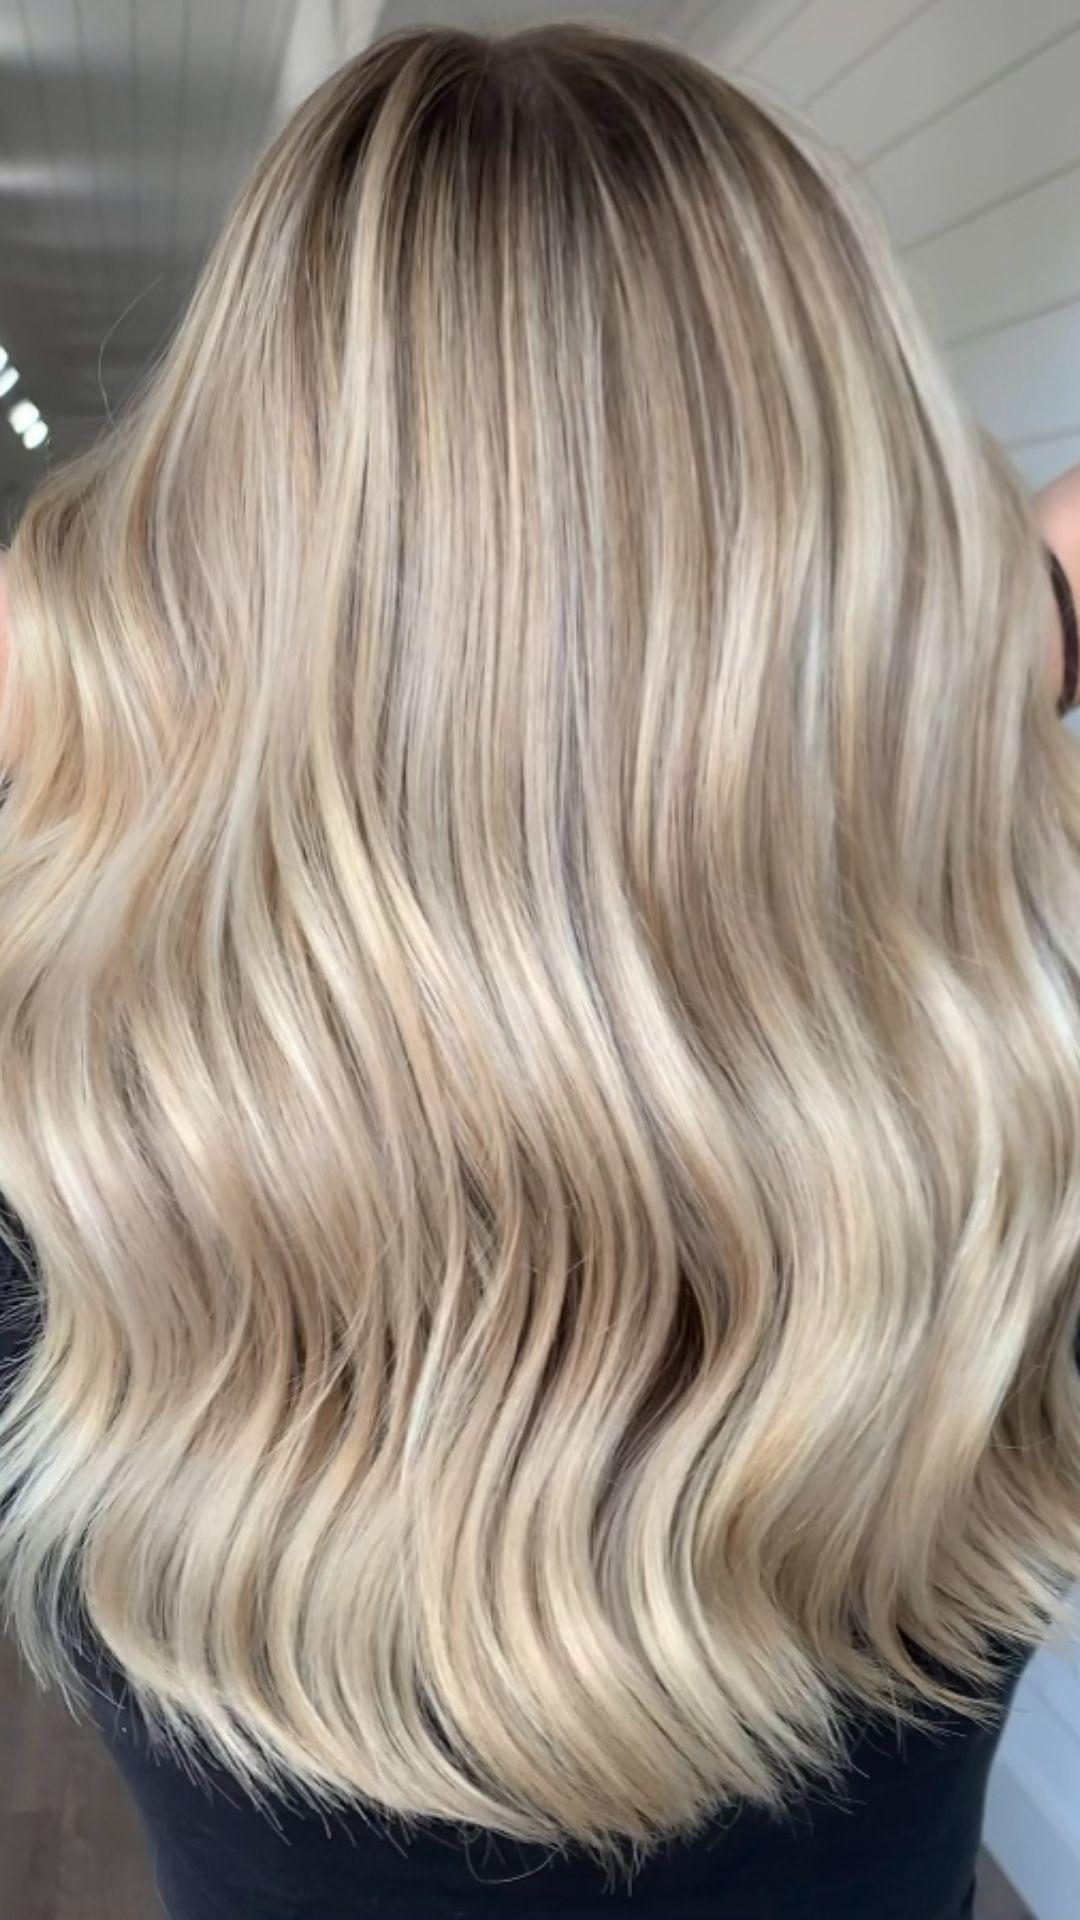 Blonde balayage highlights